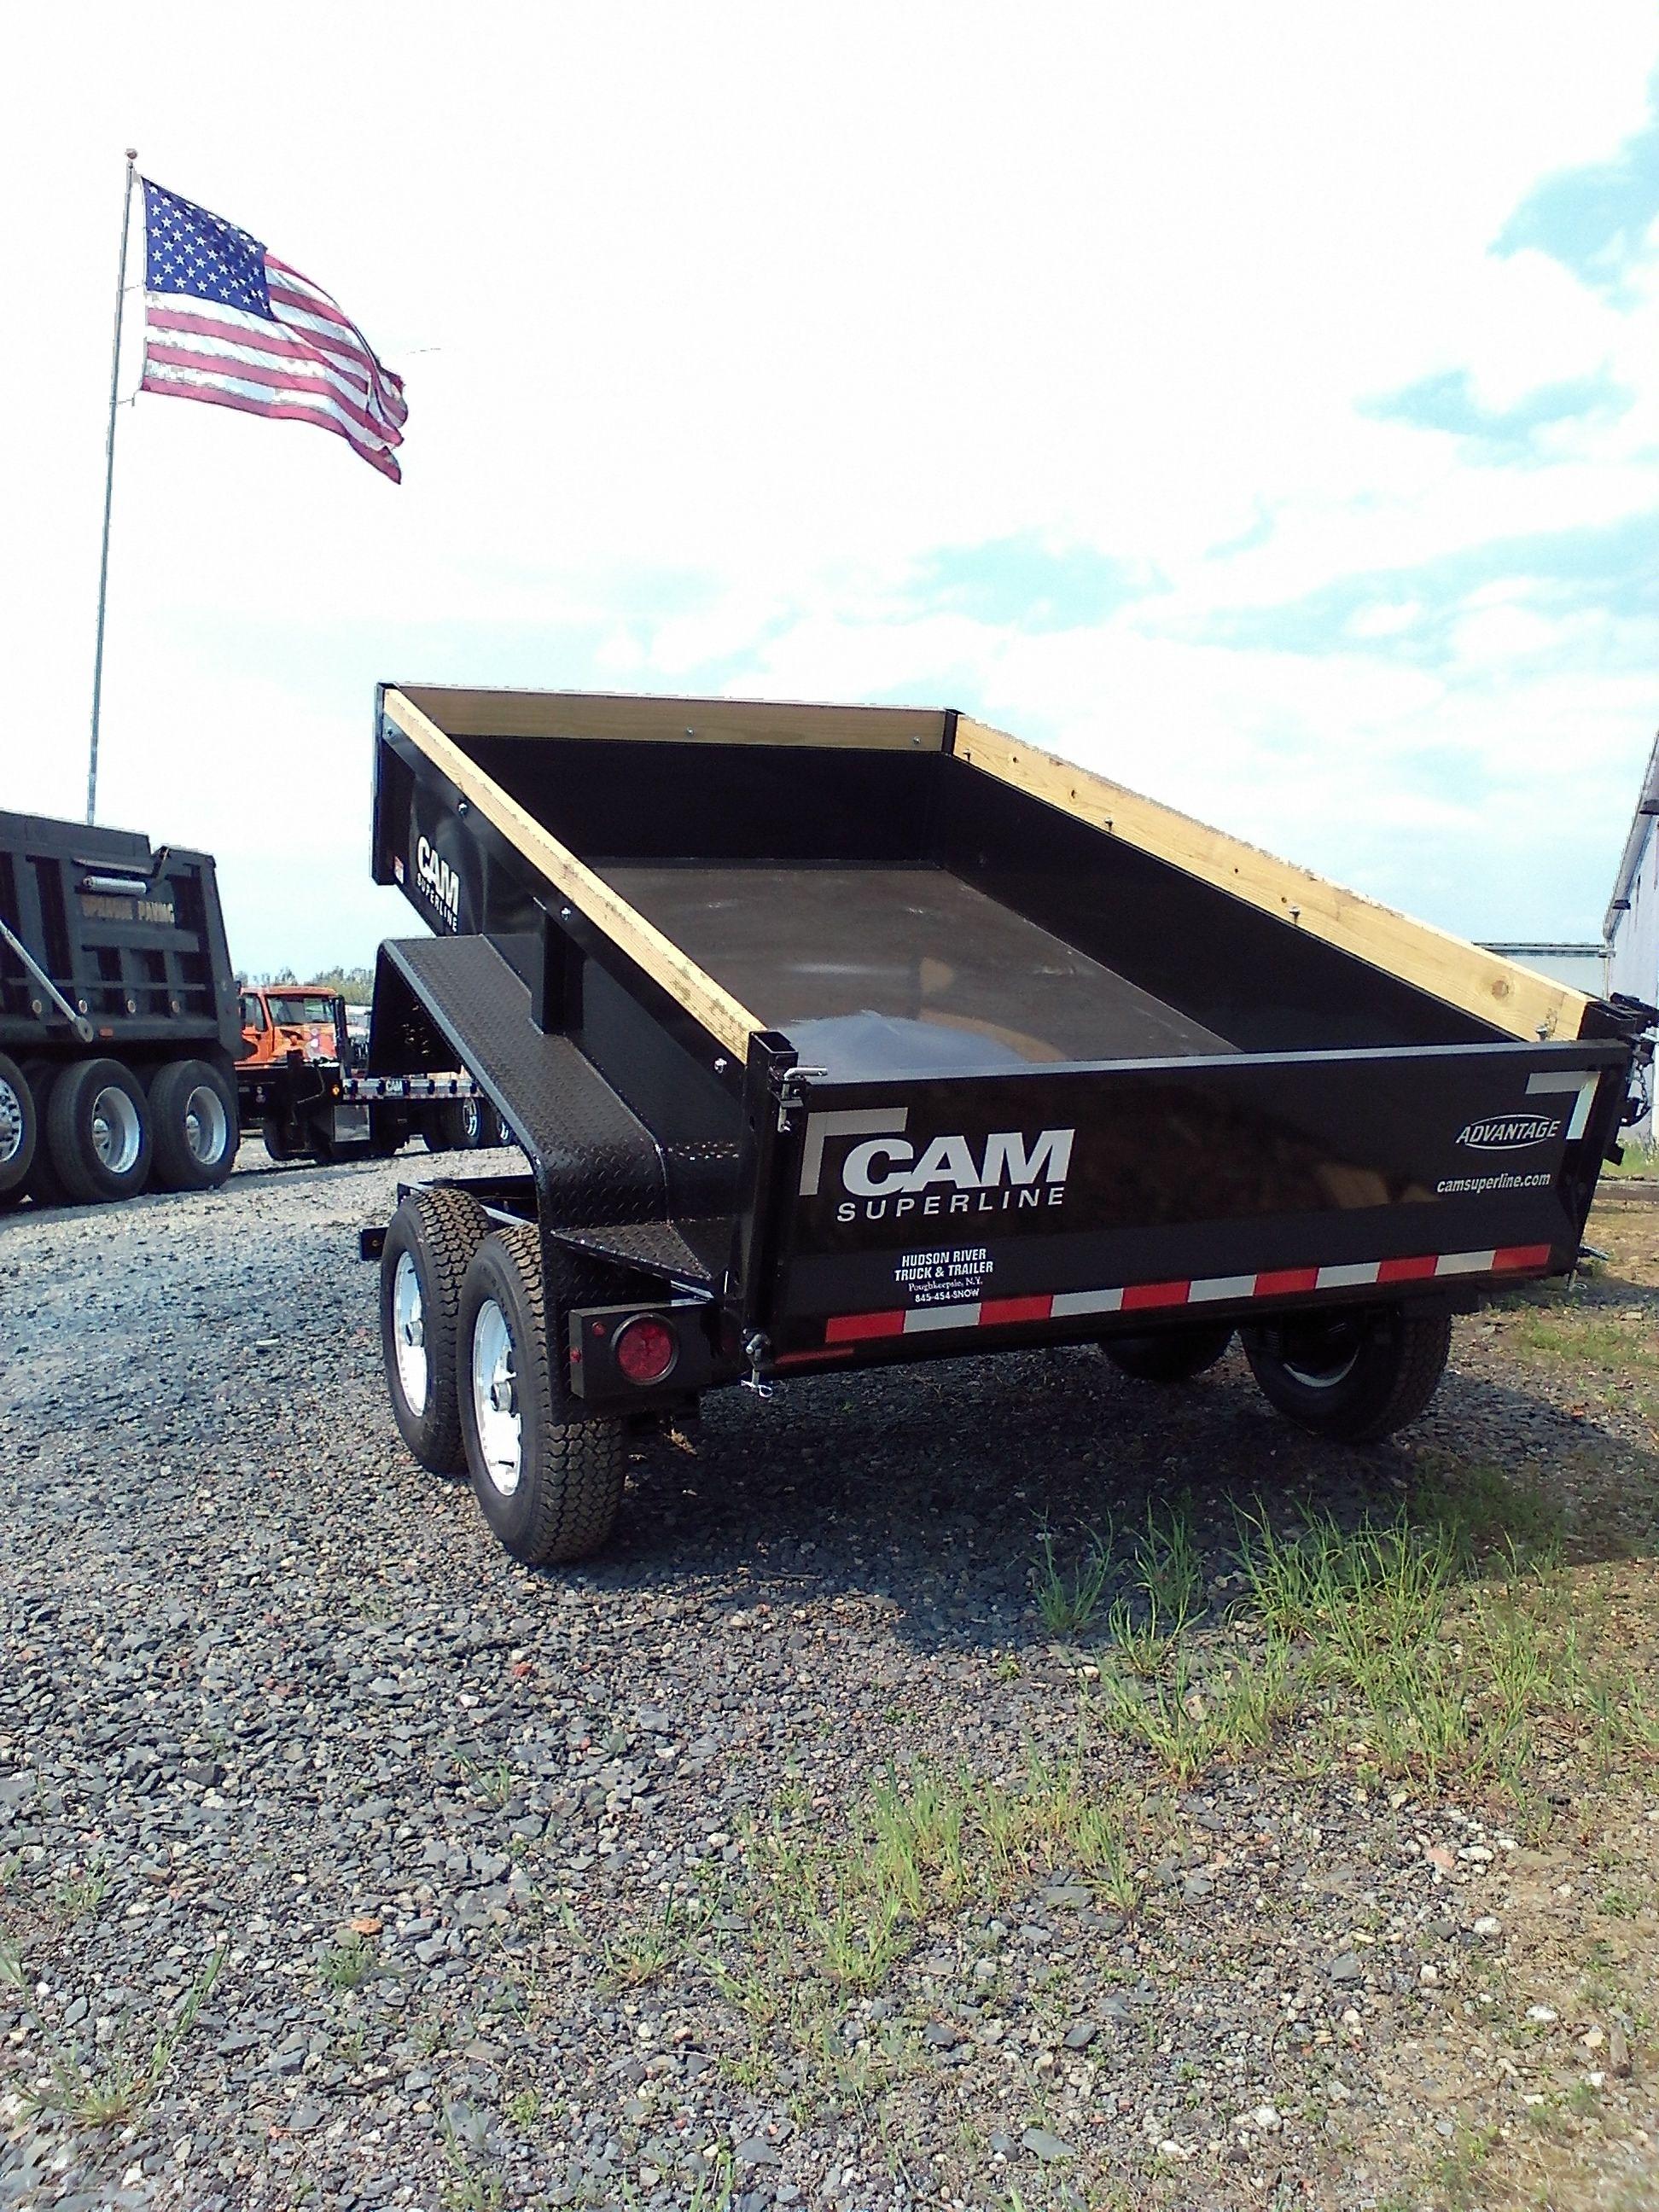 Inventory Sales Hudson River Truck Trailer Flatbed Trailer For Sale Dump Trailers Flatbed Trailer